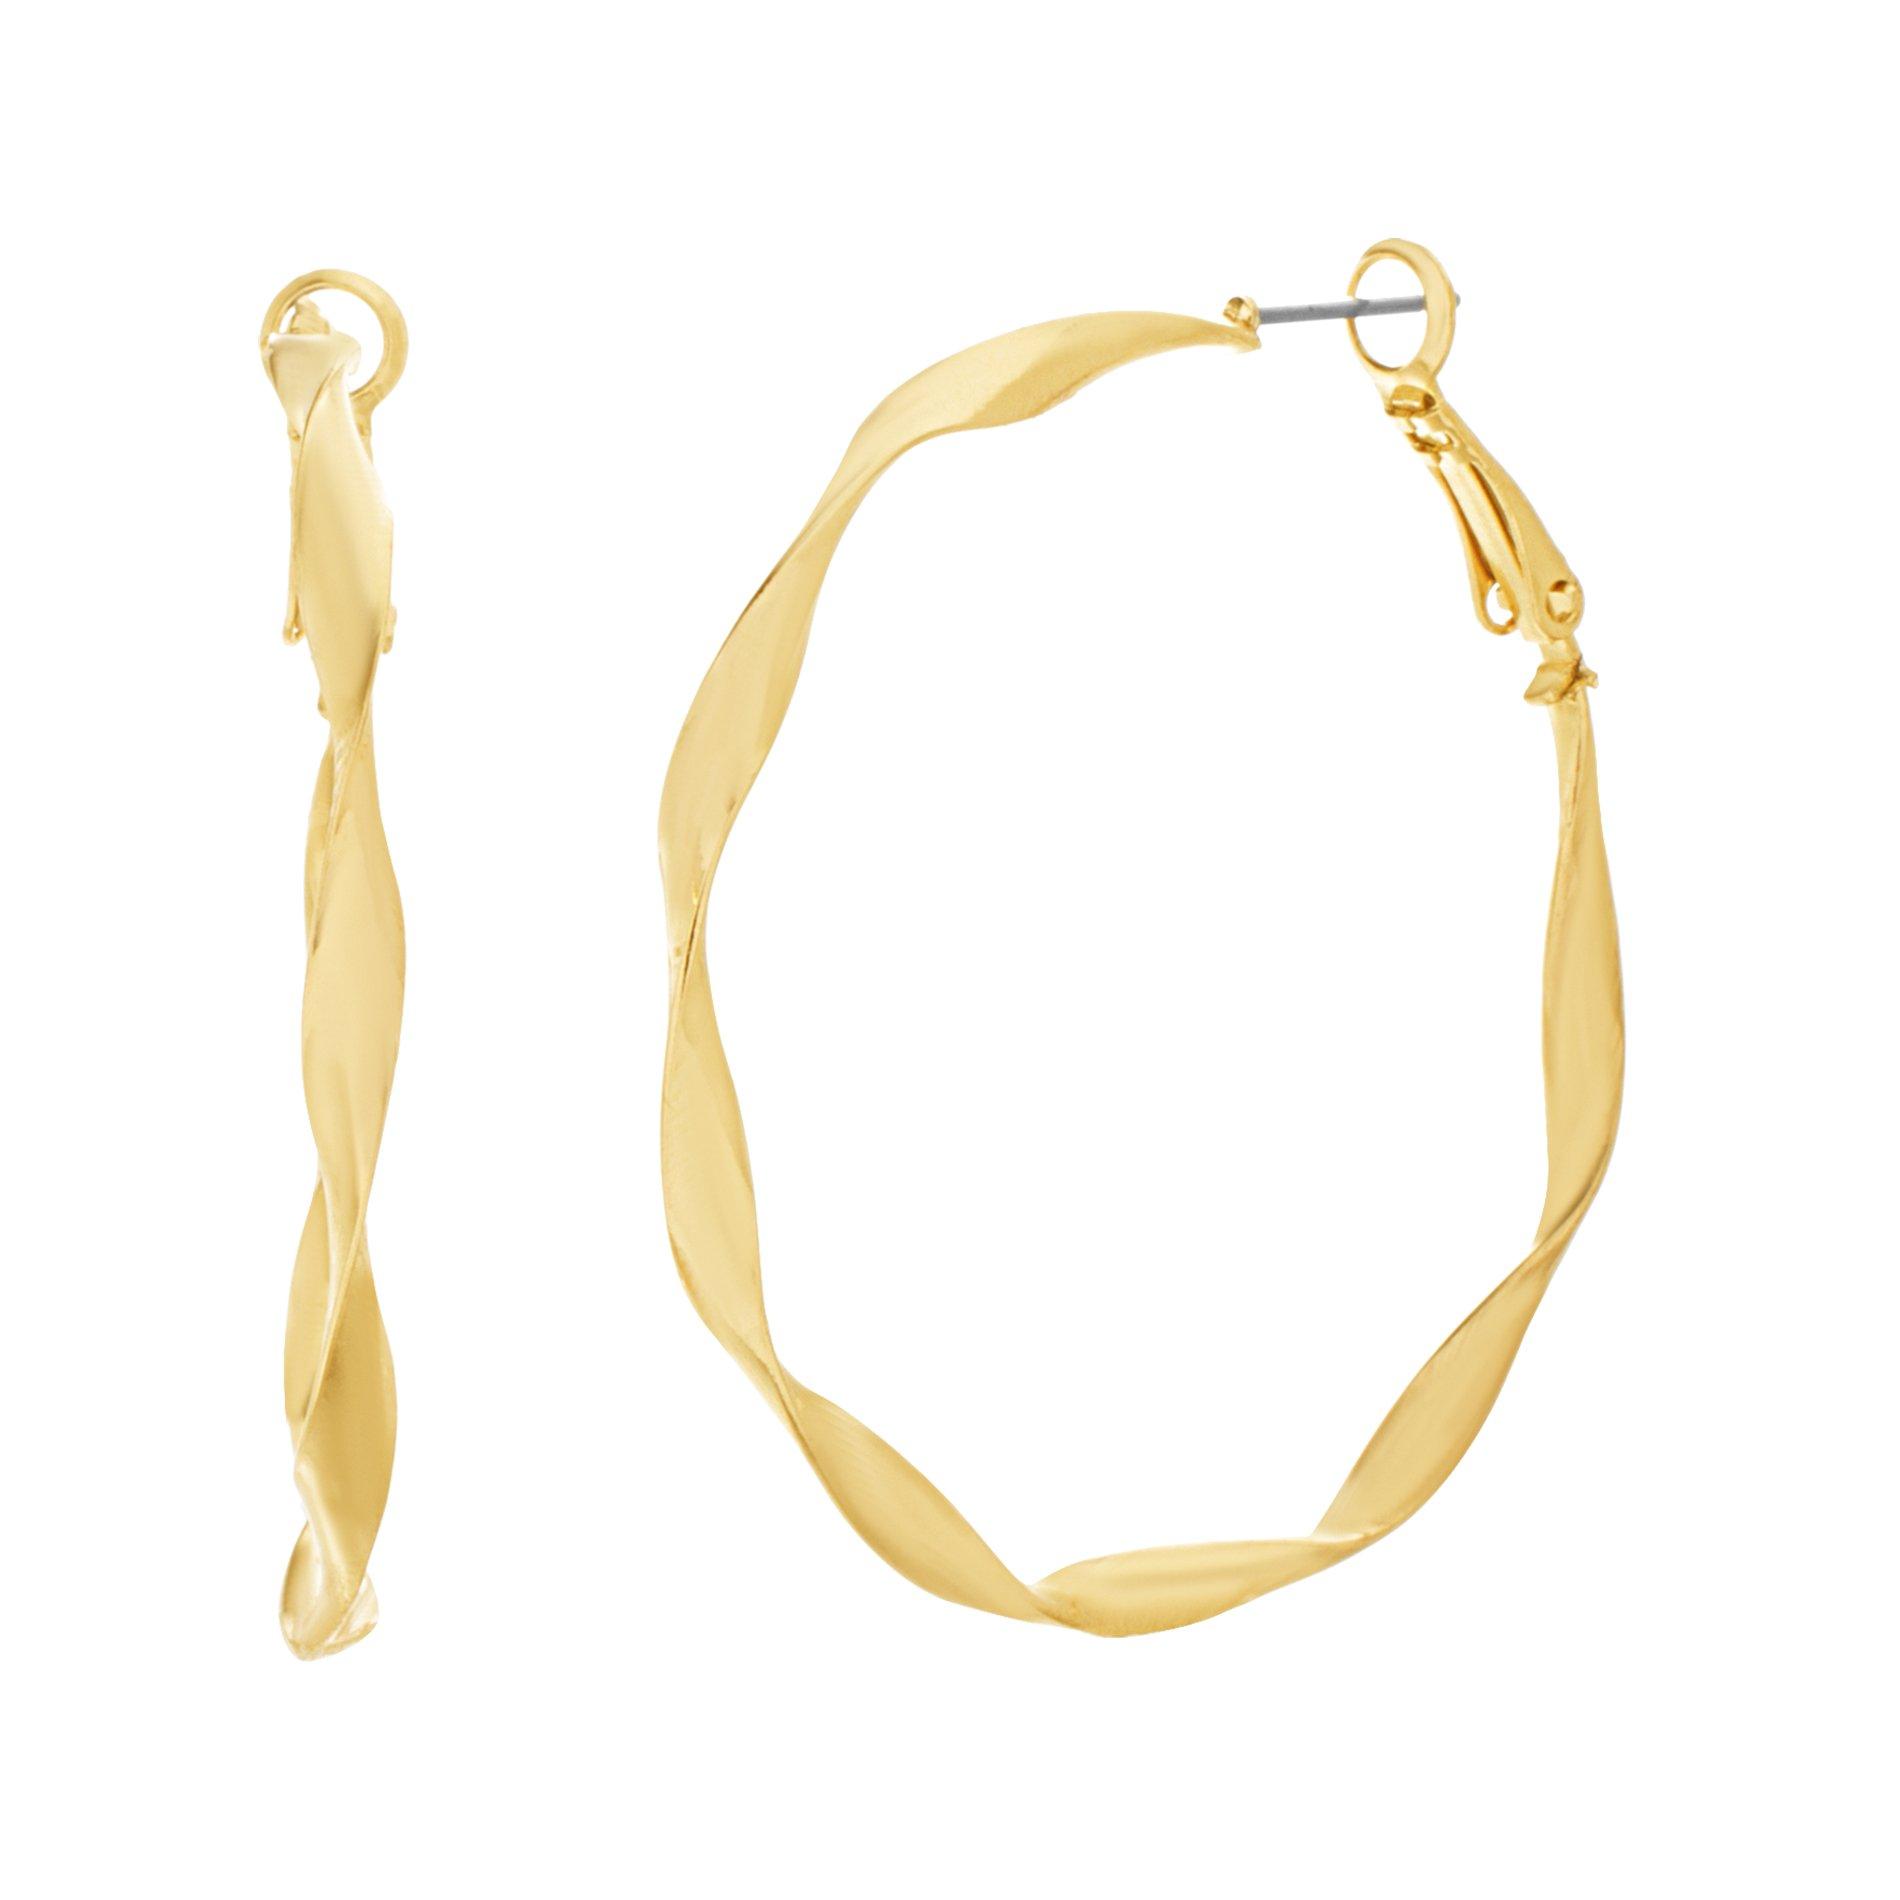 Catherine Malandrino Women's Polished Twisted Yellow Gold-Tone Hoop Earrings (Yellow)